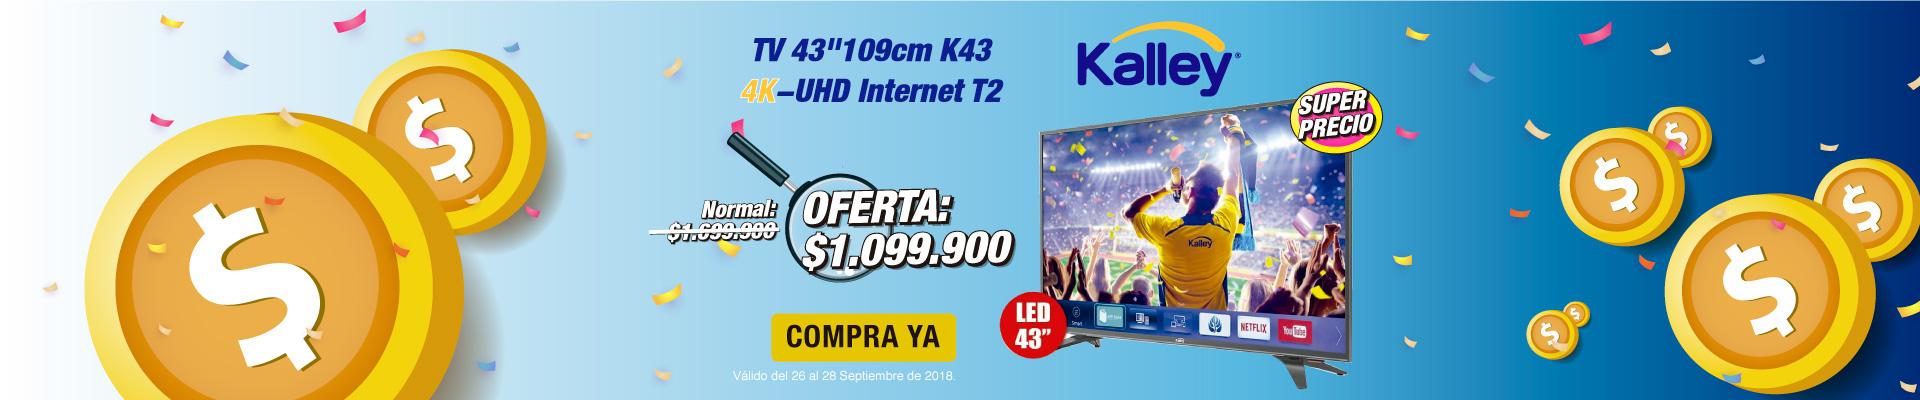 BP ALKP TV 43